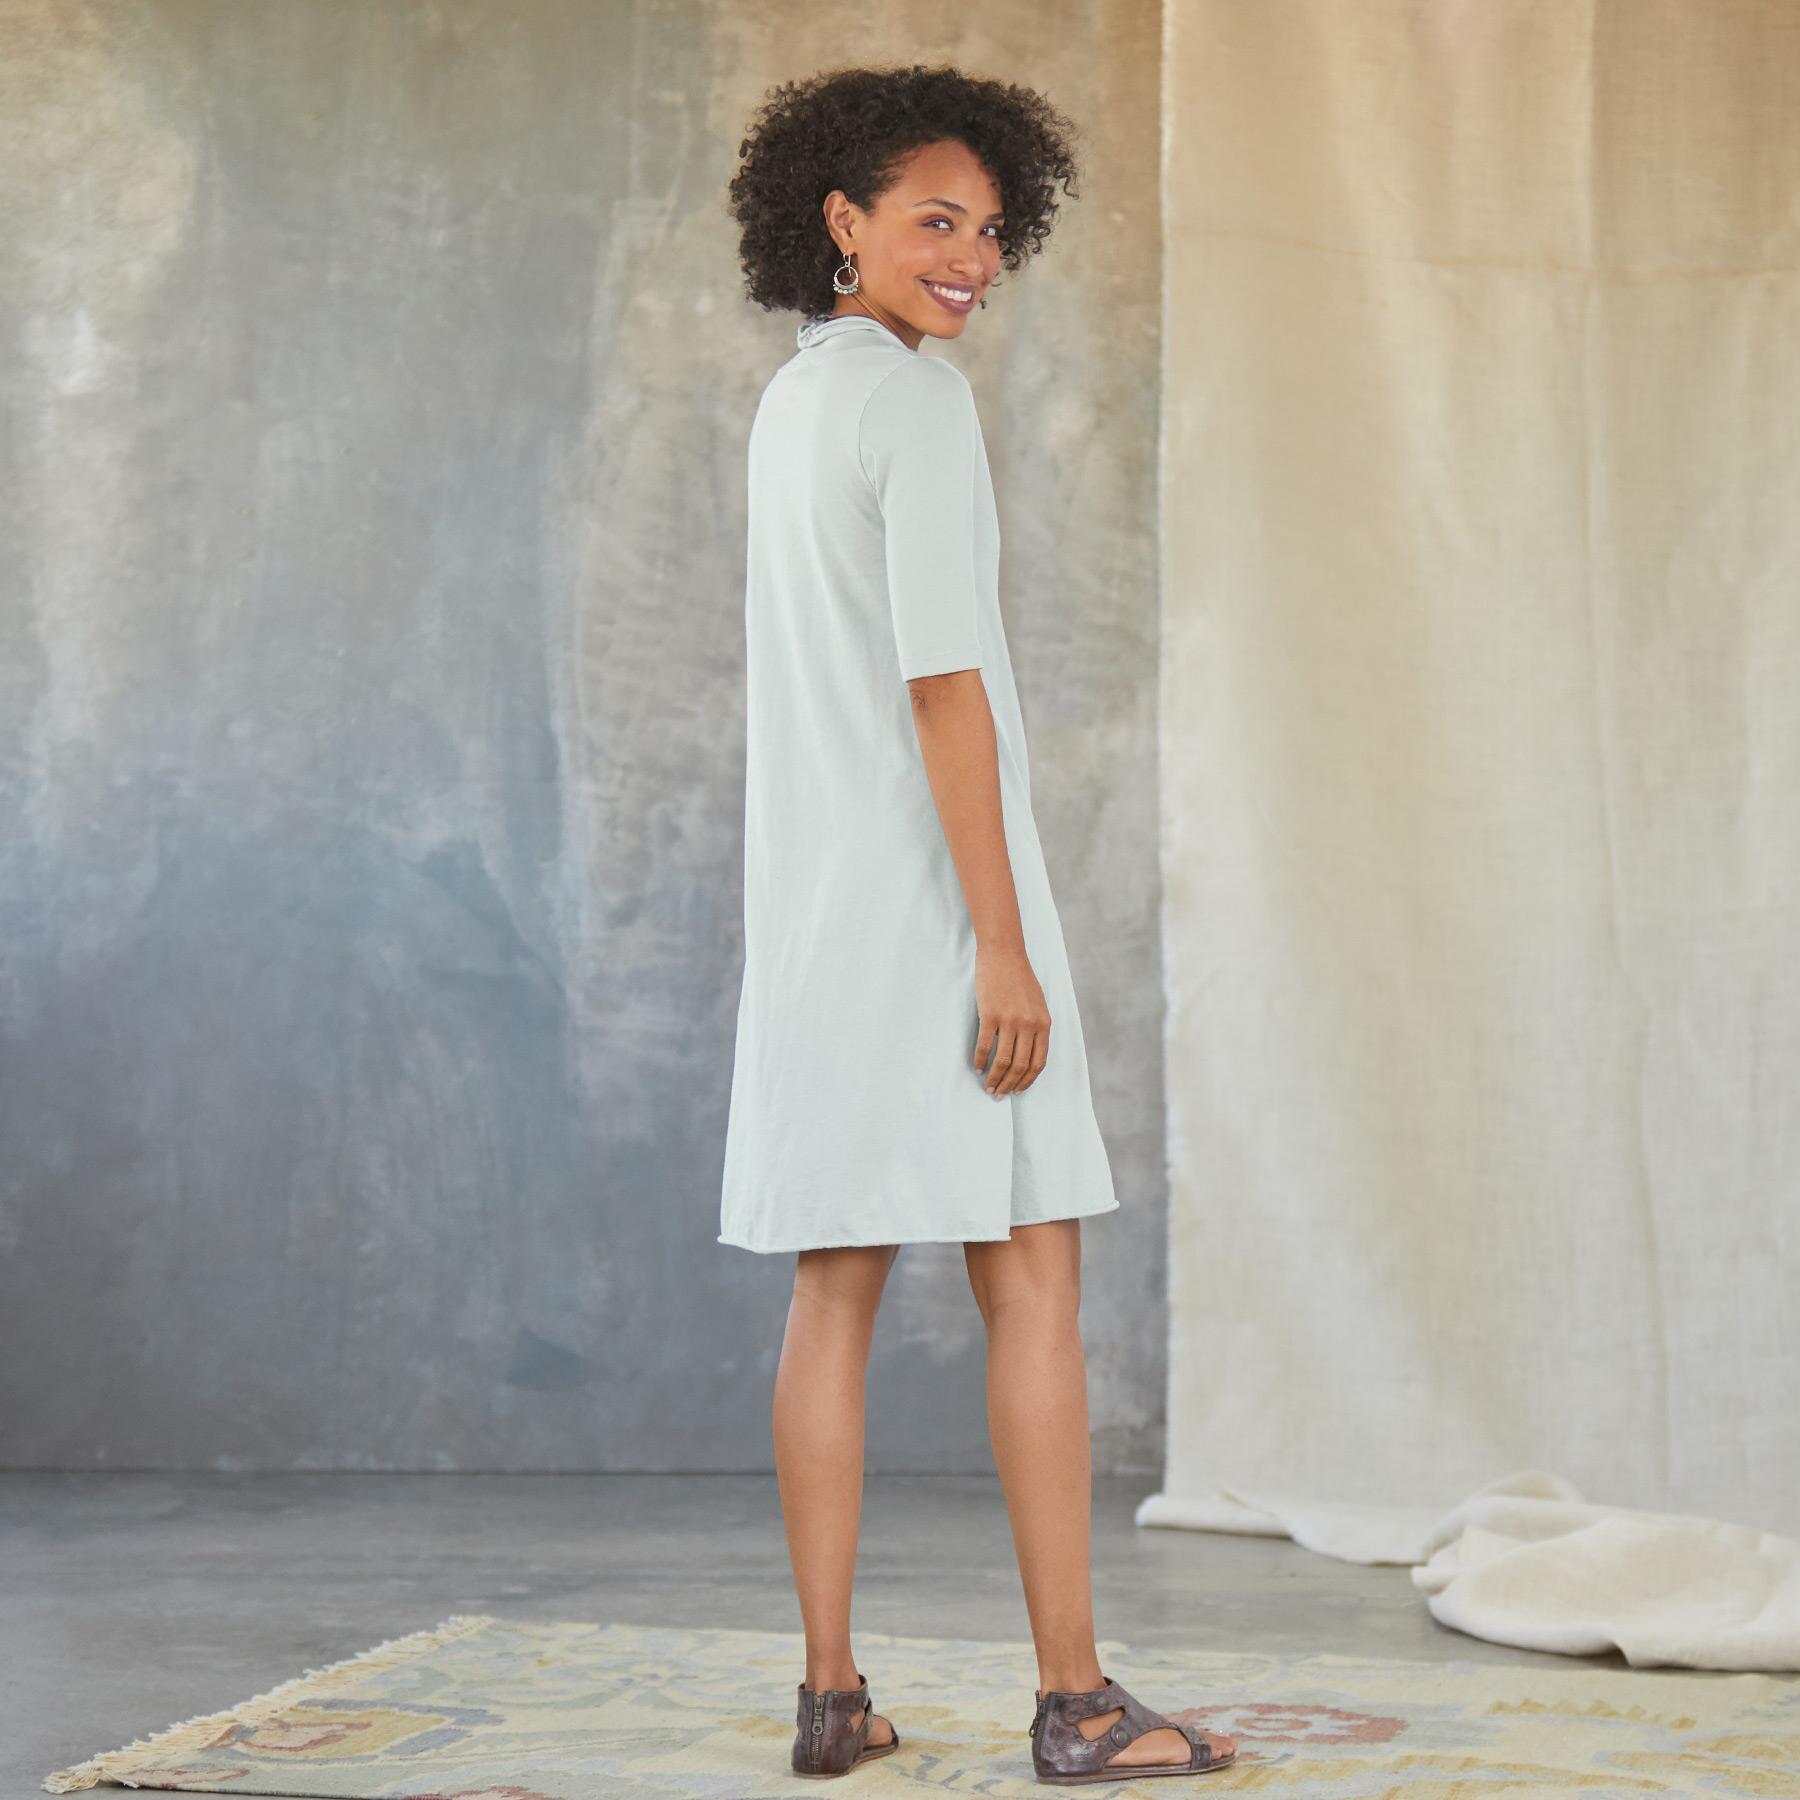 FALCONET DRESS: View 2